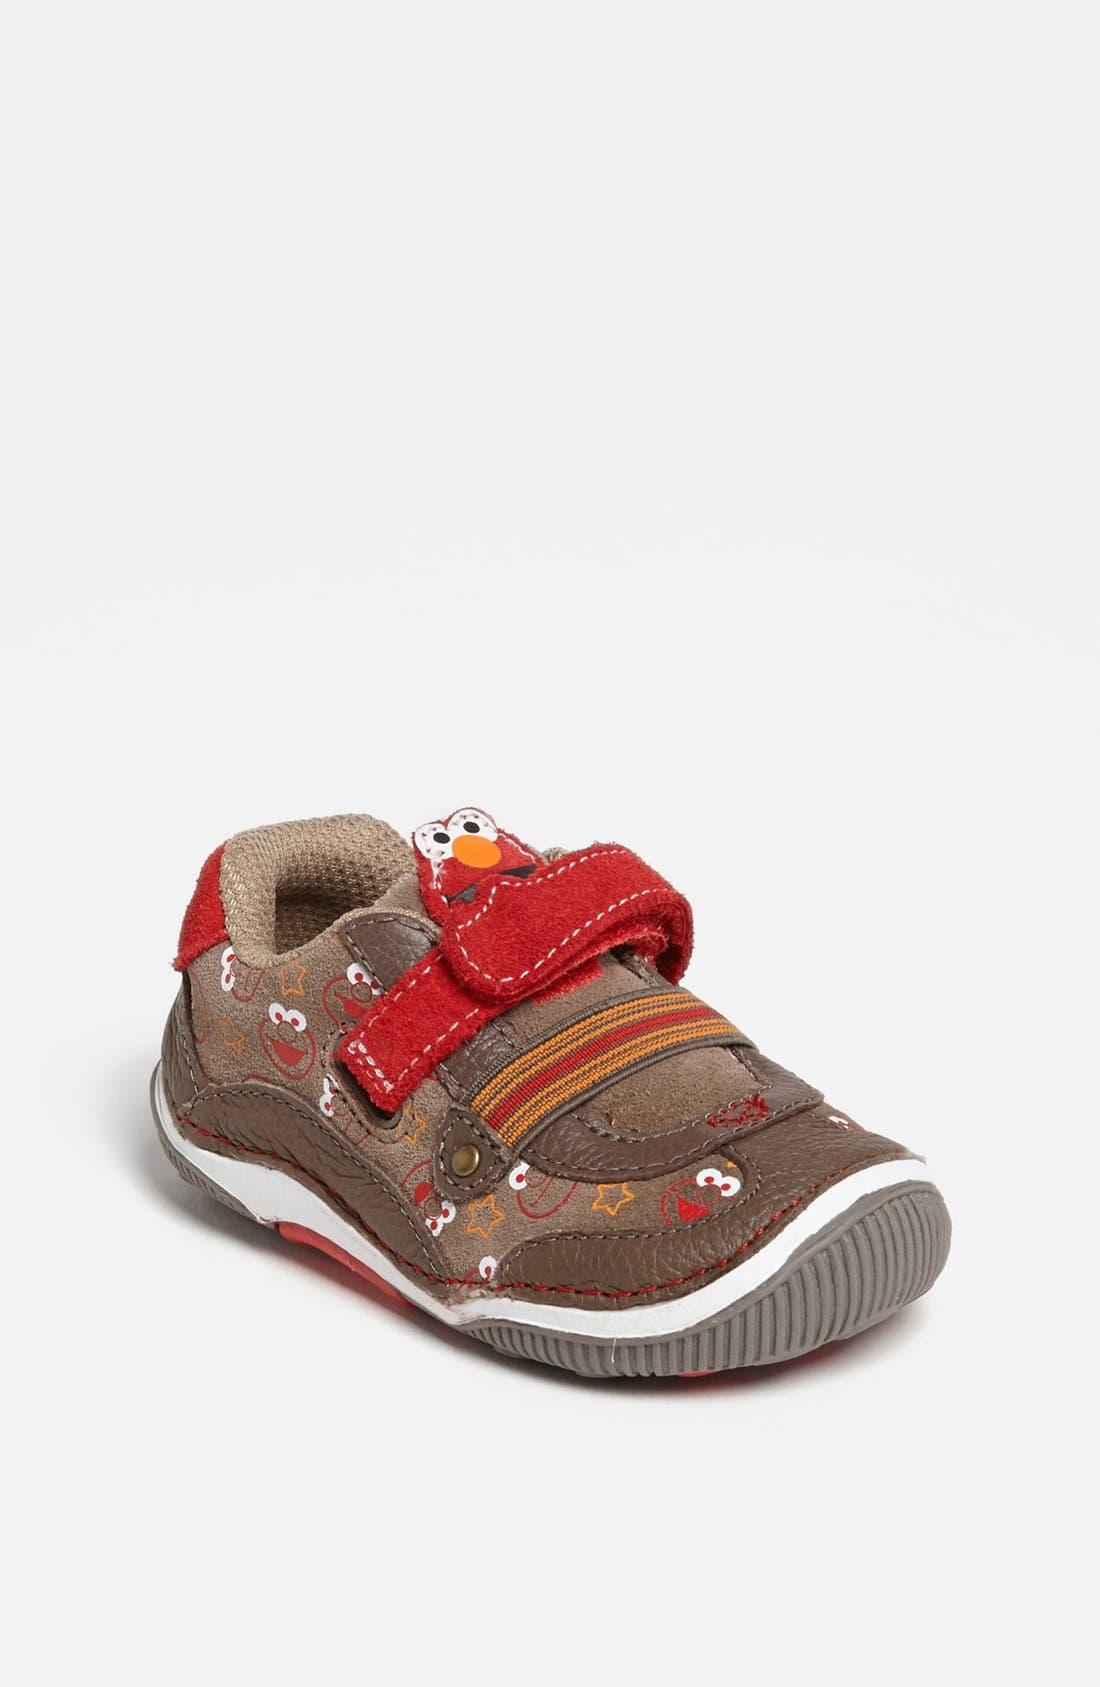 Main Image - Stride Rite ' Embracers™ - Elmo™' Sneaker (Baby, Walker & Toddler)